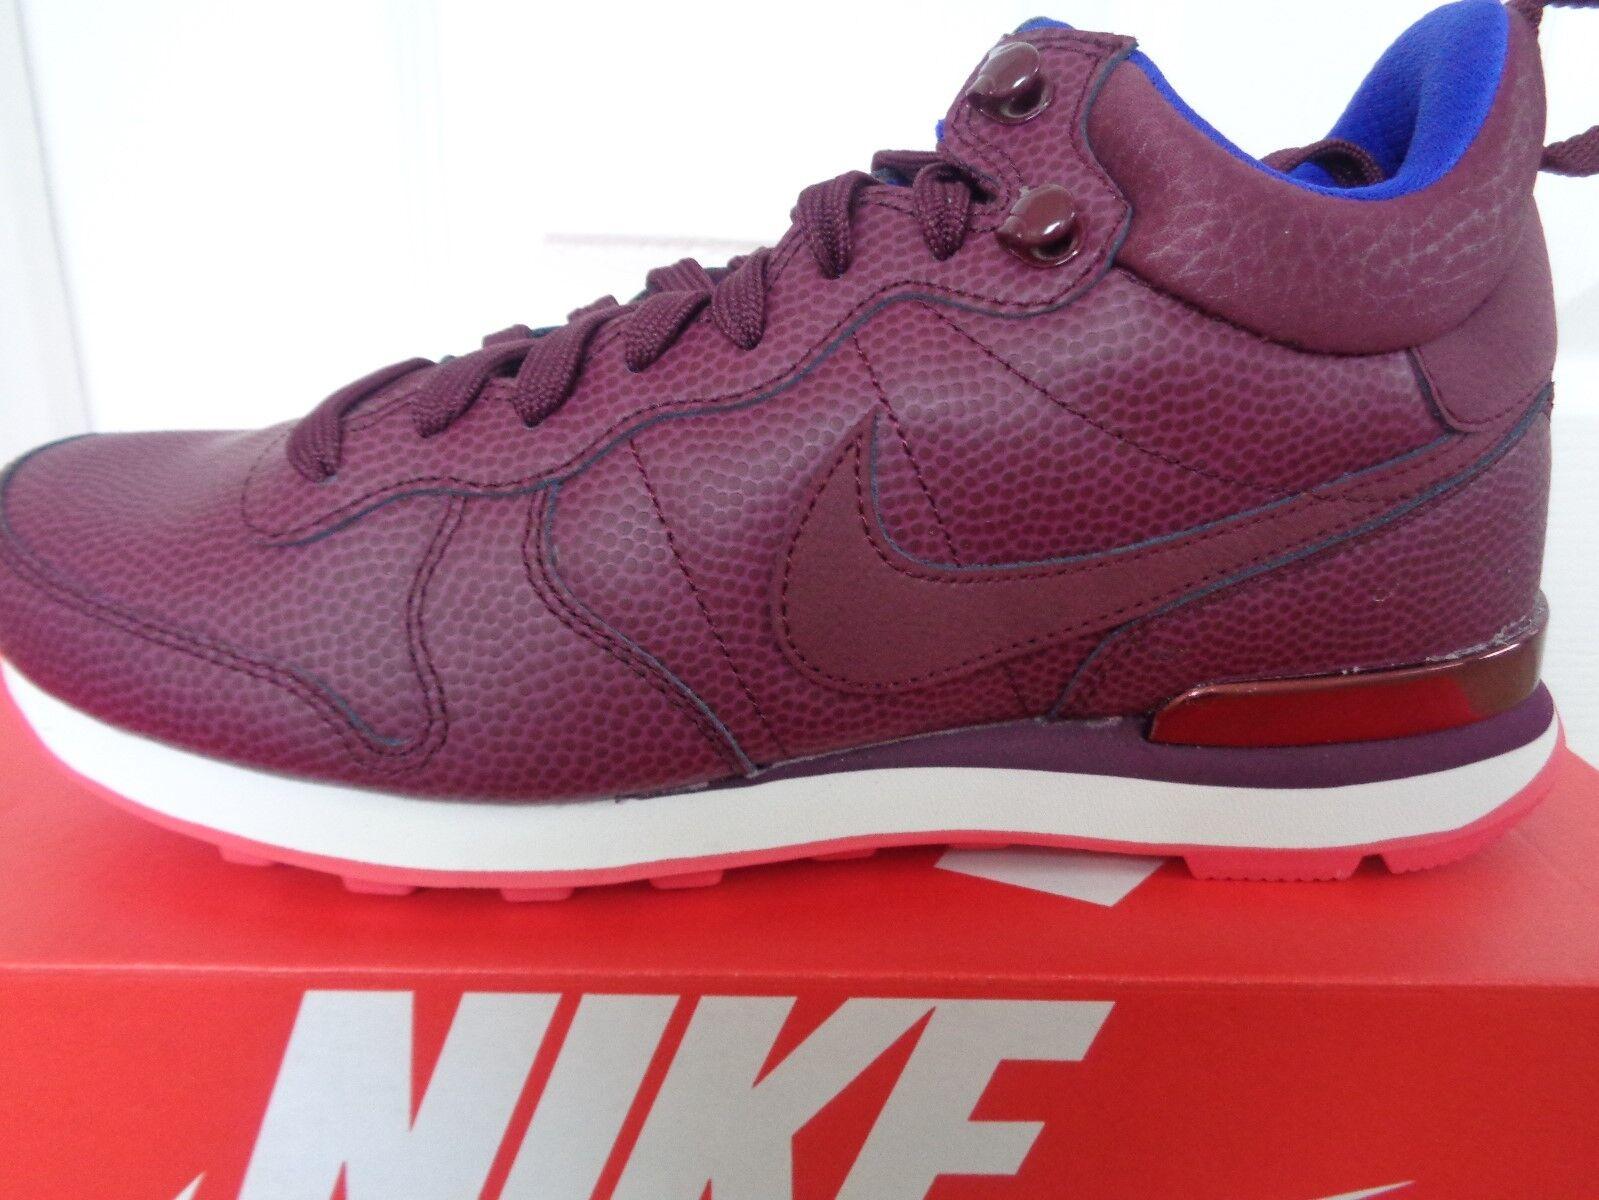 Nike Internationalist Mid Lthr Femme Baskets 859549 UK 4.5 EU 38 US 7 Neuf + Boîte